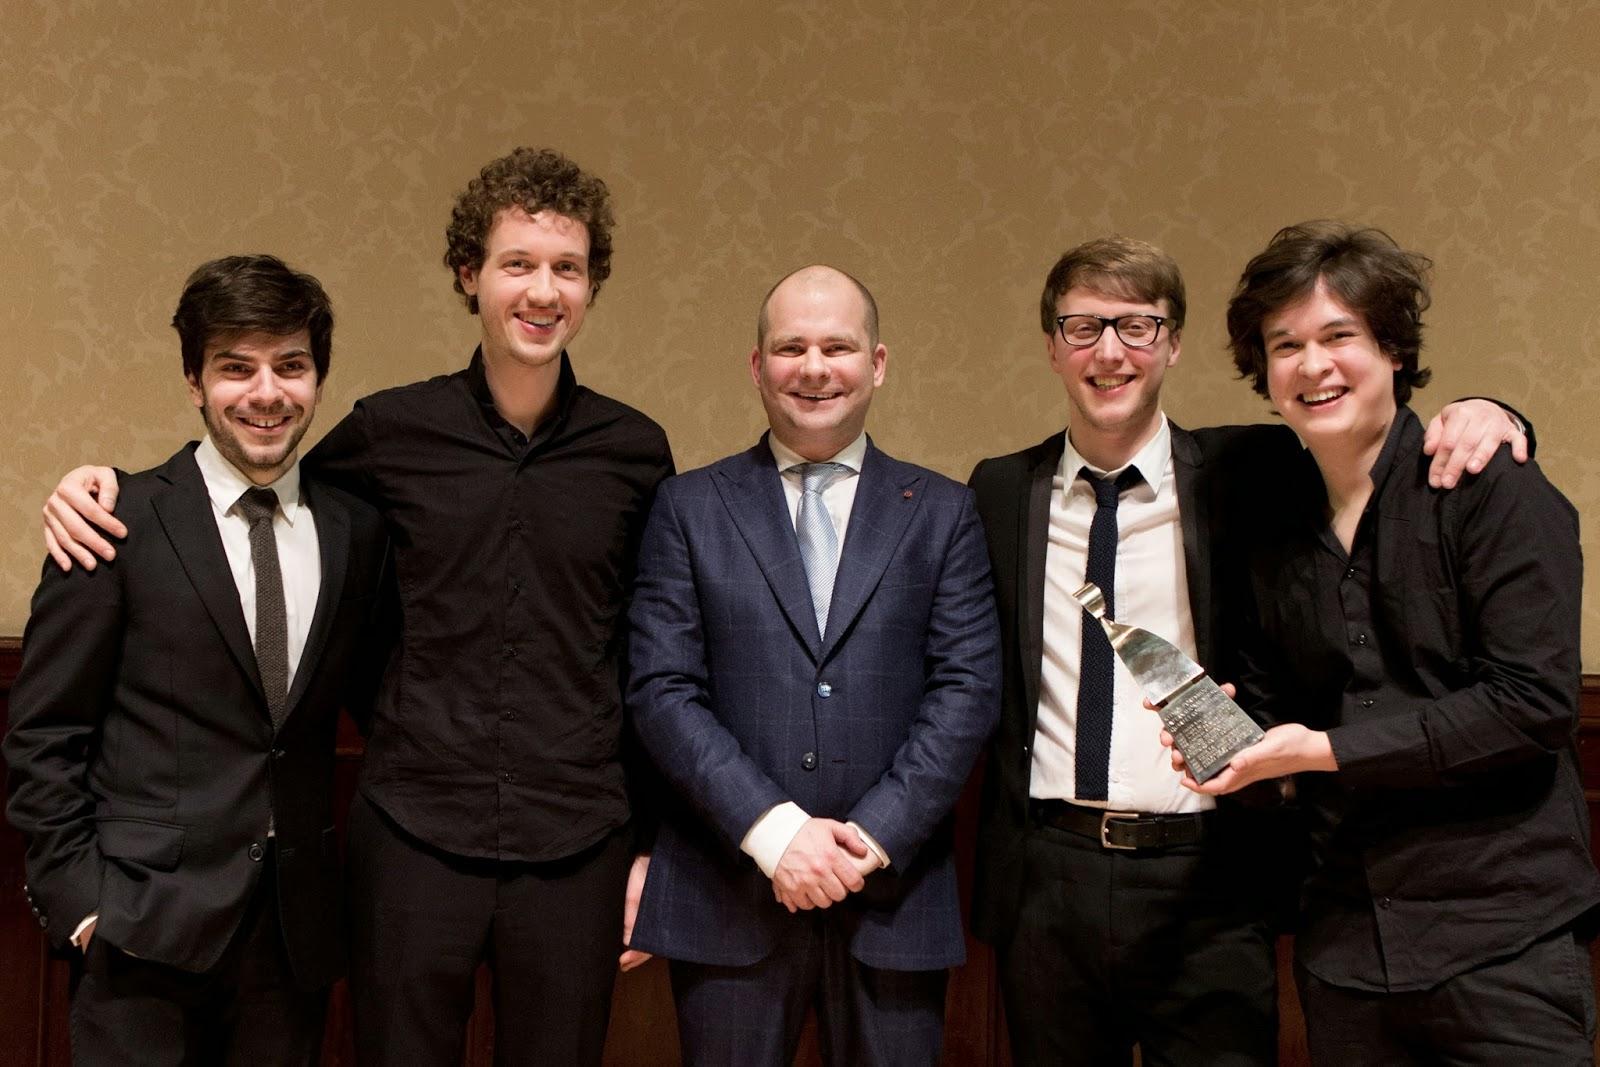 Van Kuijk Quartet receiving their award from competition chairman John Gilhooly - photo Ben Ealovega